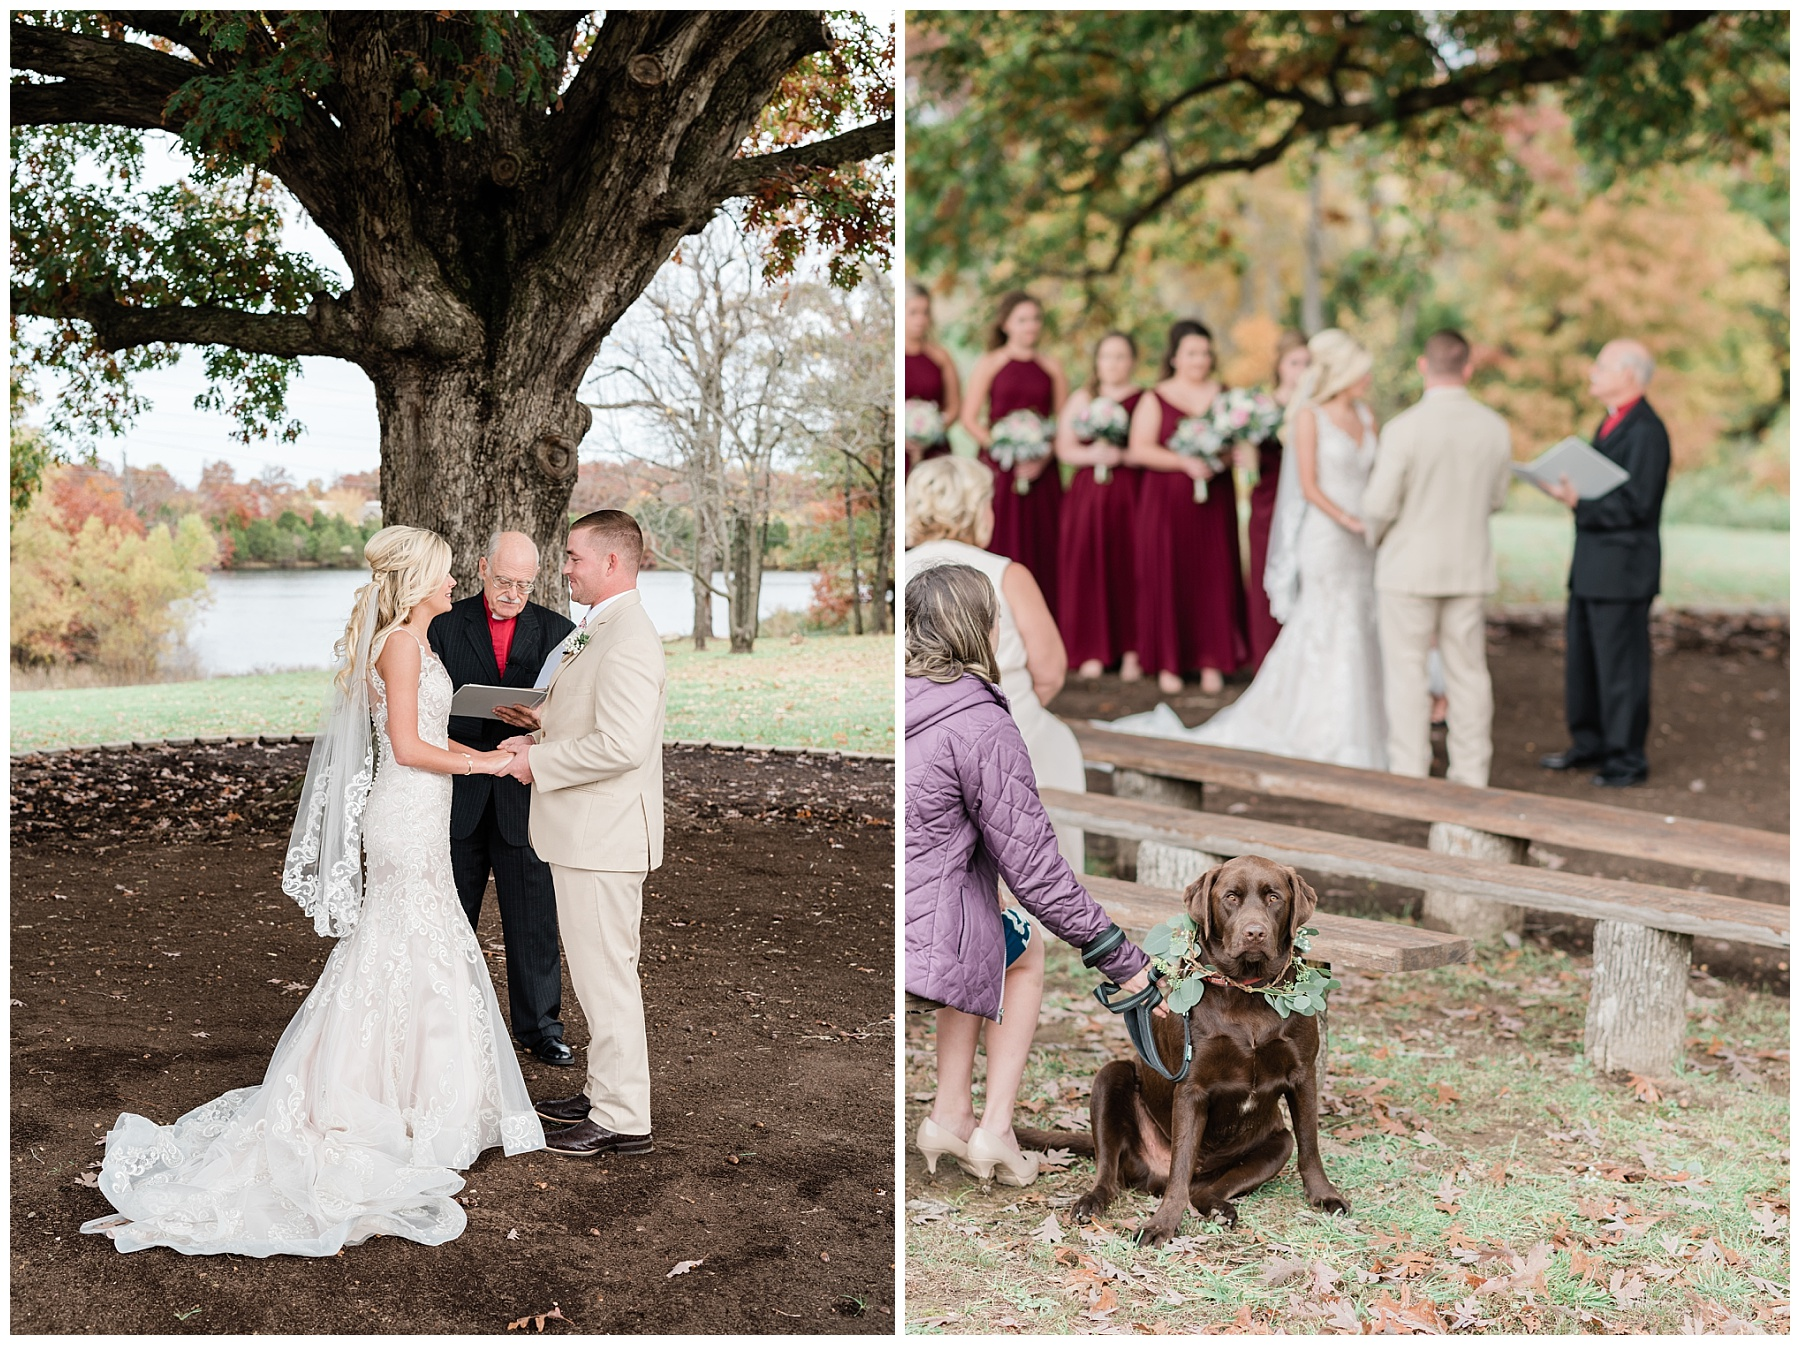 Lakeside Wedding in Fall at Mighty Oak Lodge by Misouri Wedding Photographer Kelsi Kliethermes Photography_0028.jpg